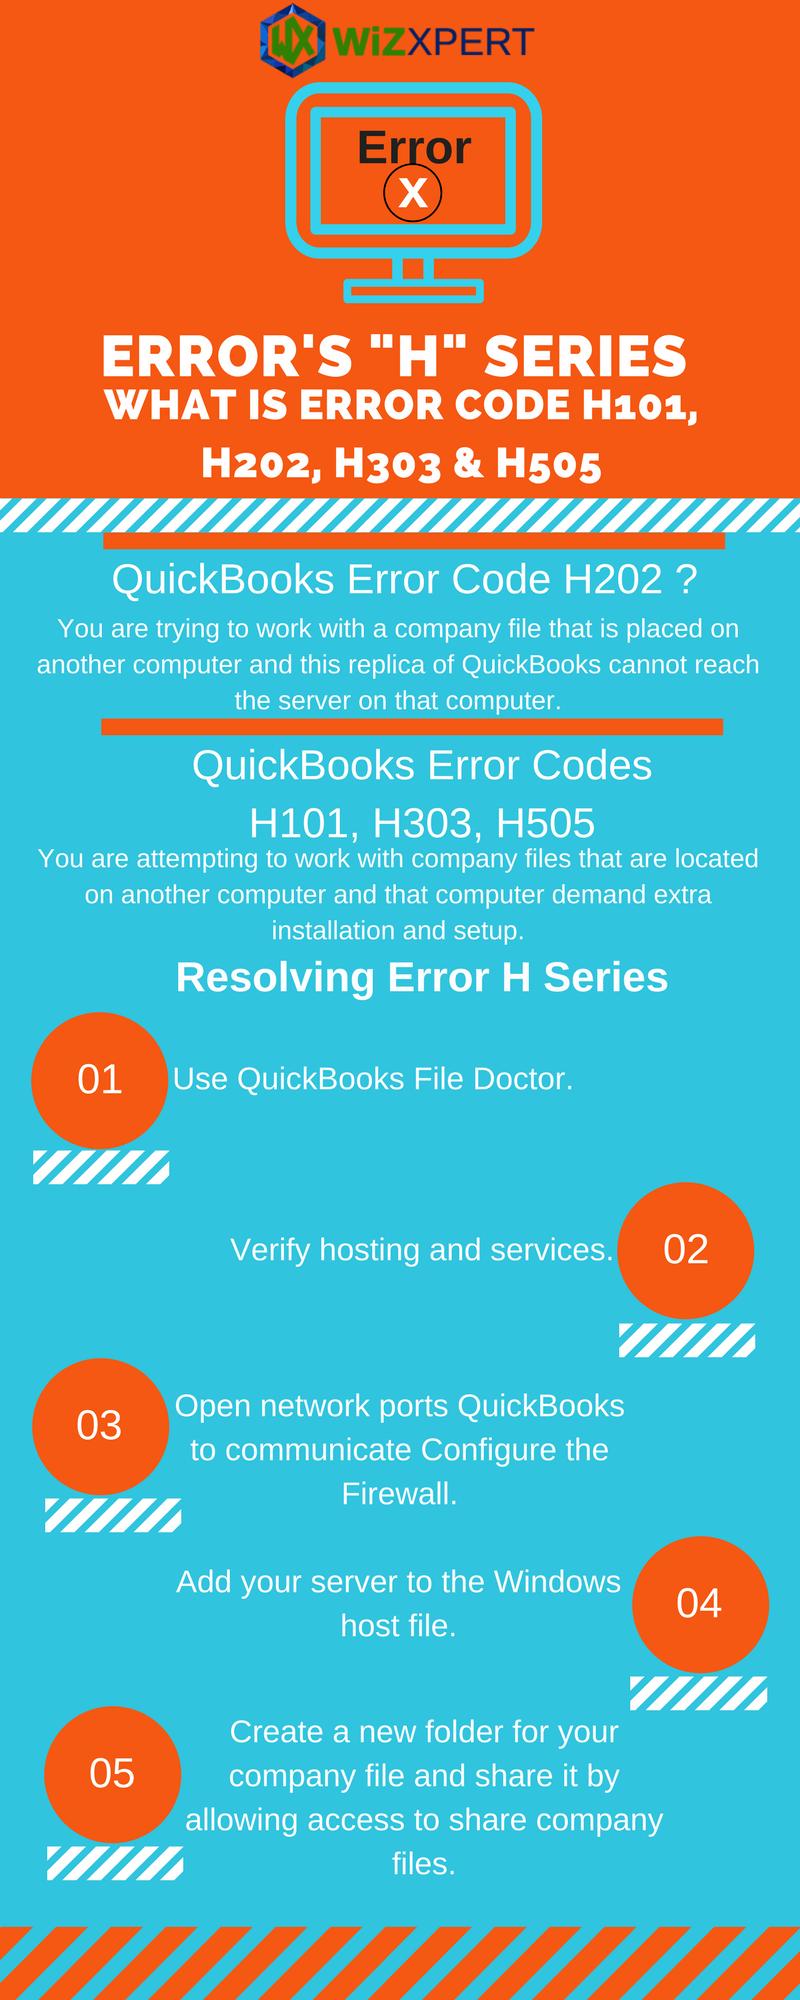 Error H101, H202, H303 H505